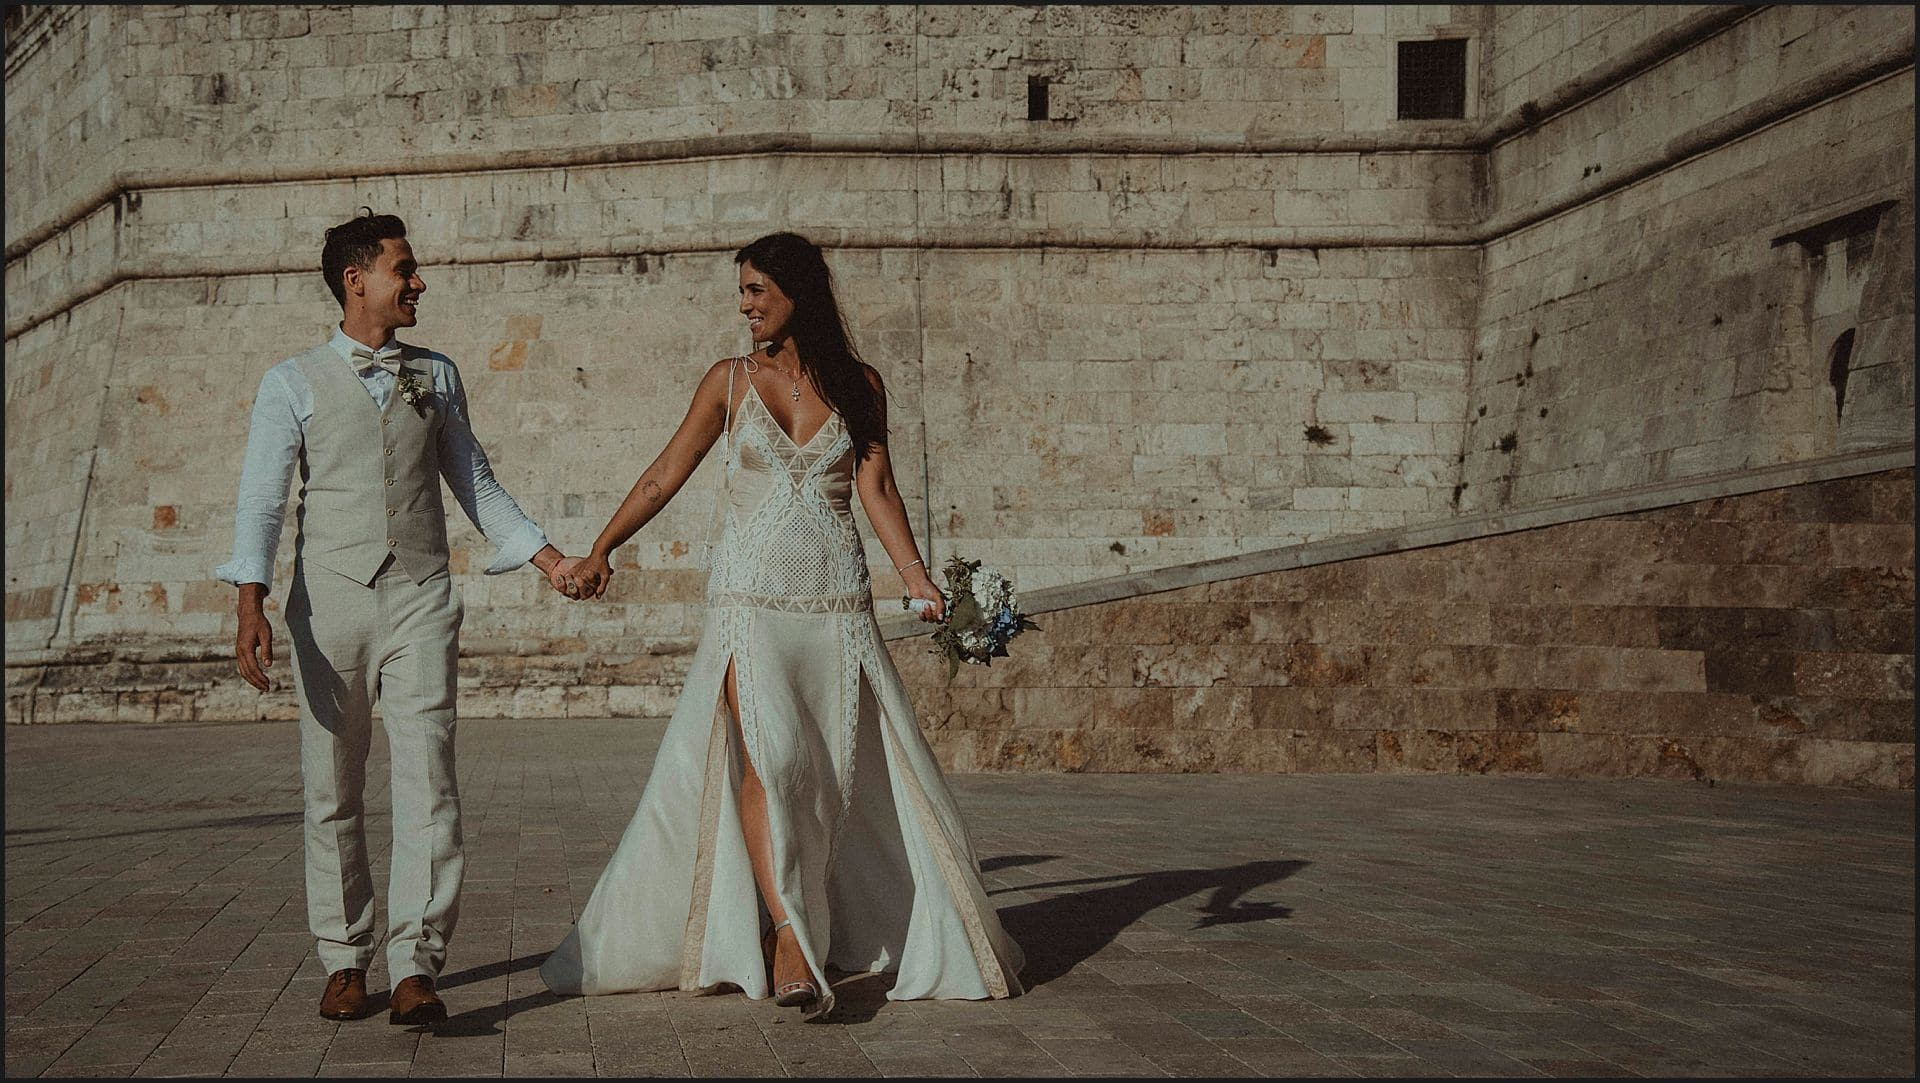 bride and groom, walking, hand in hand, destination wedding, wedding in white